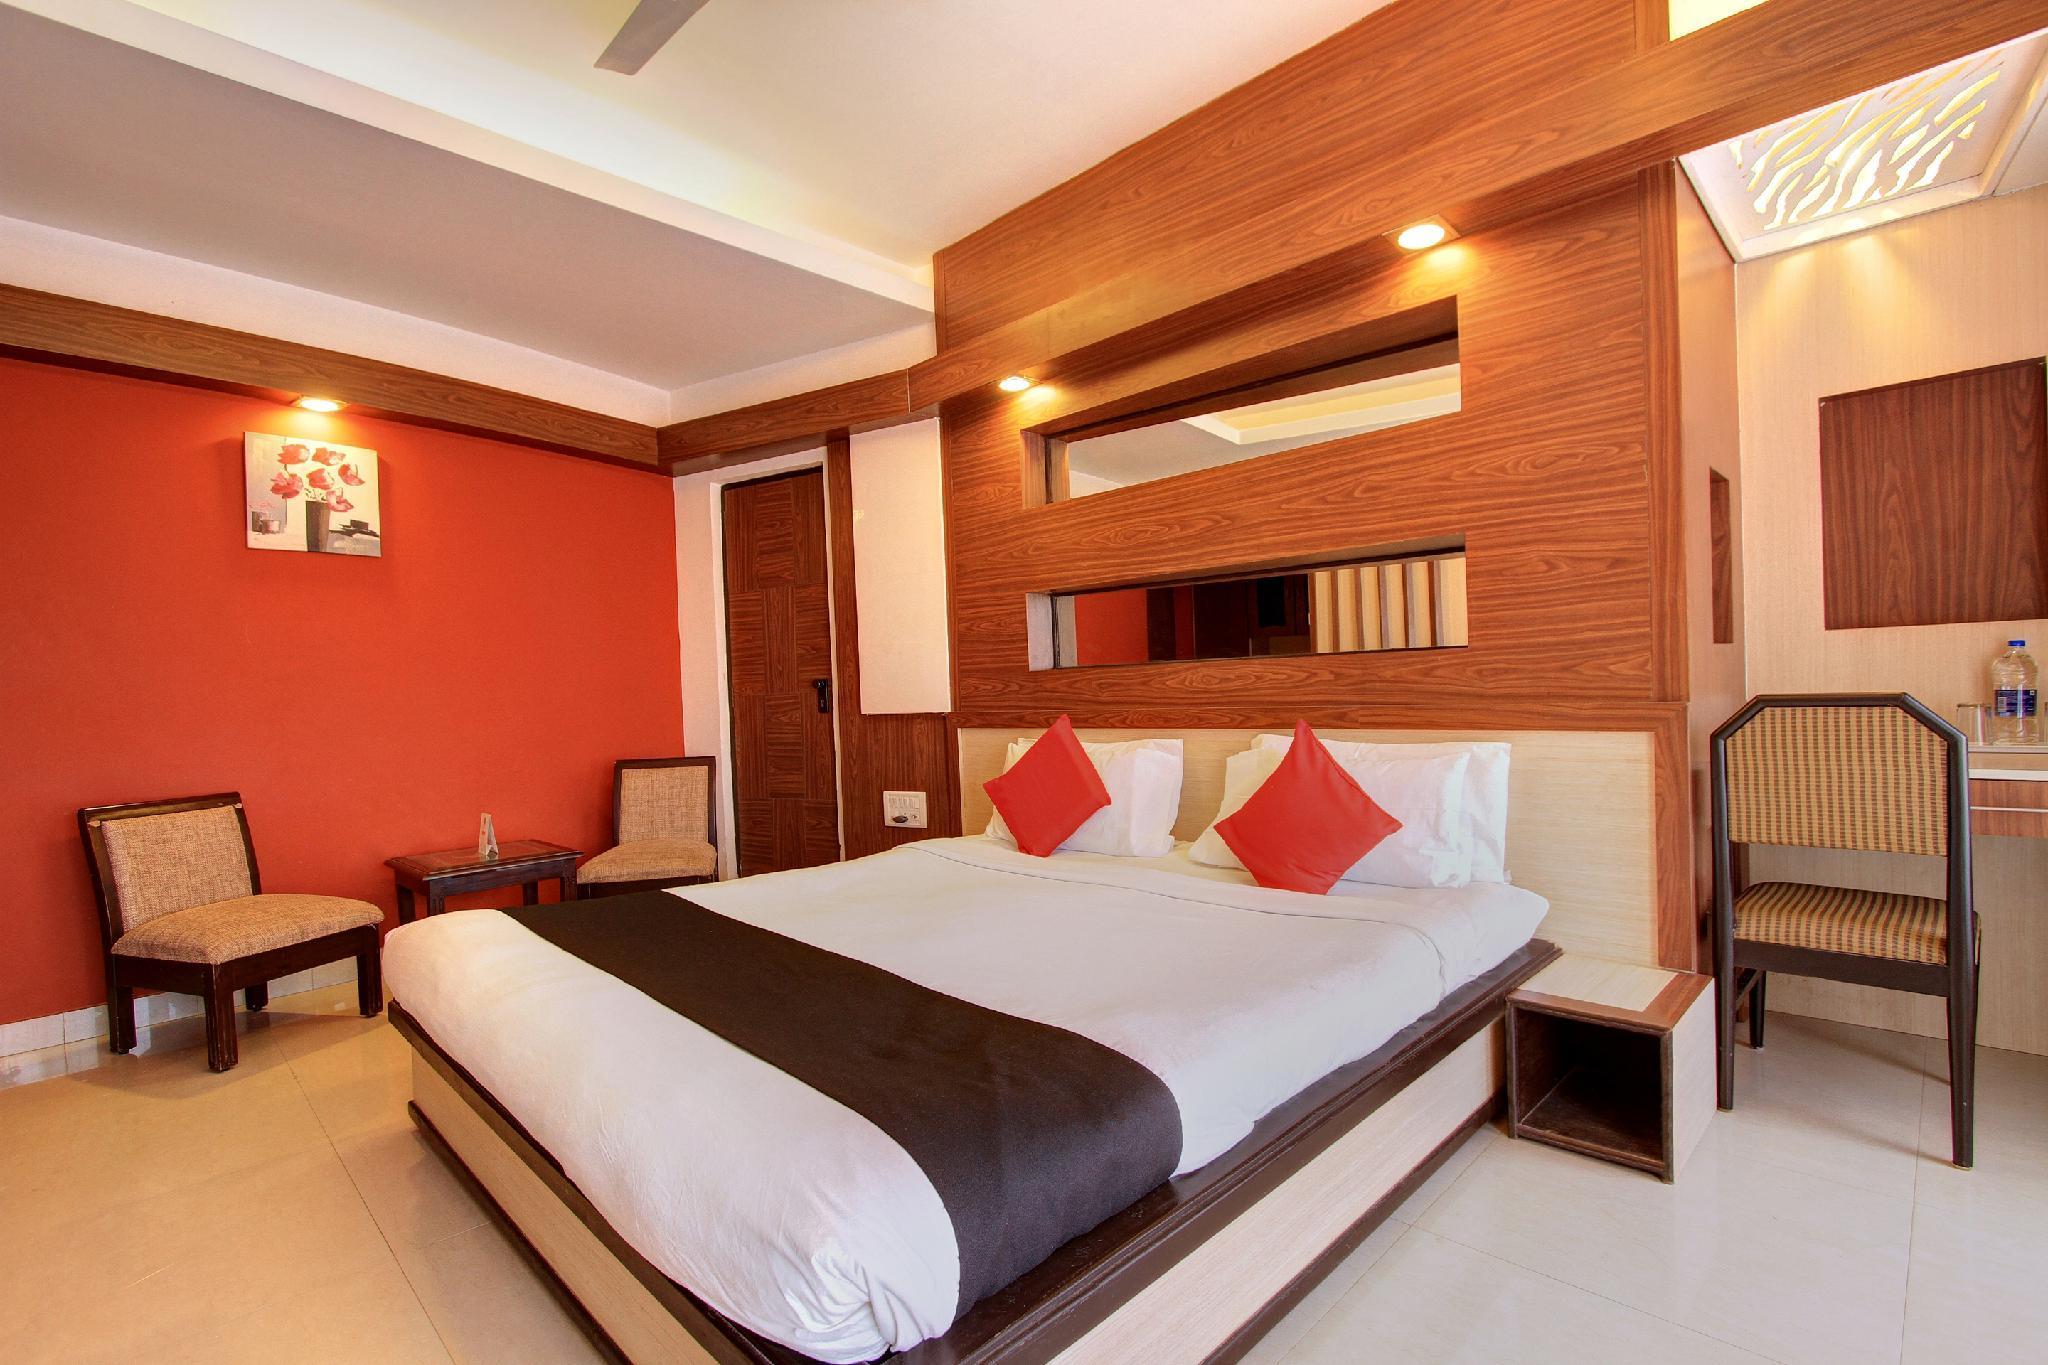 Capital O 22798 The Hans Hotel